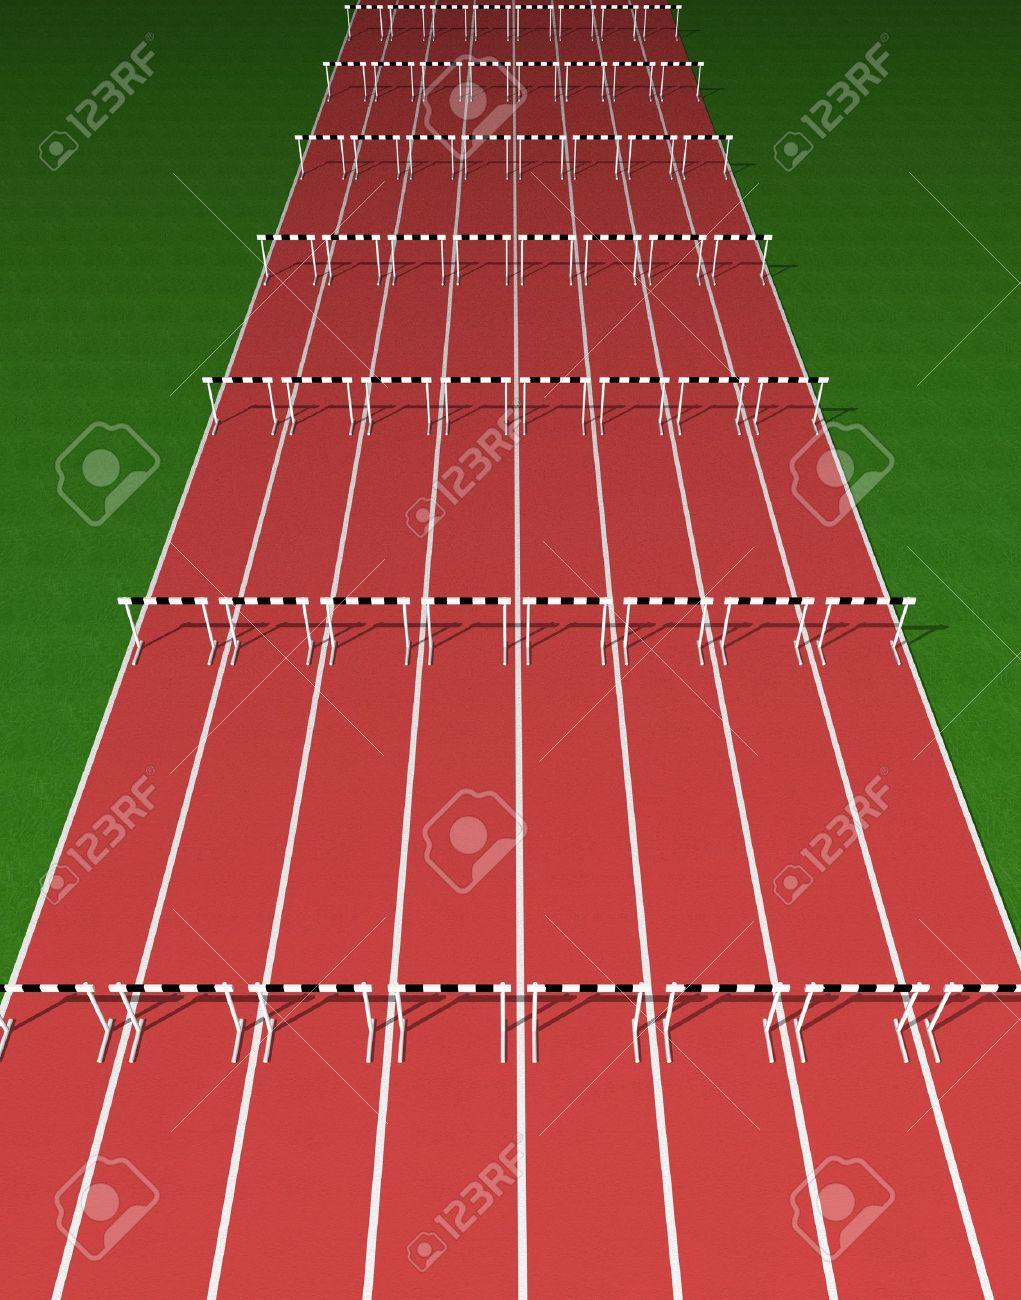 Hurdles track - 11528062